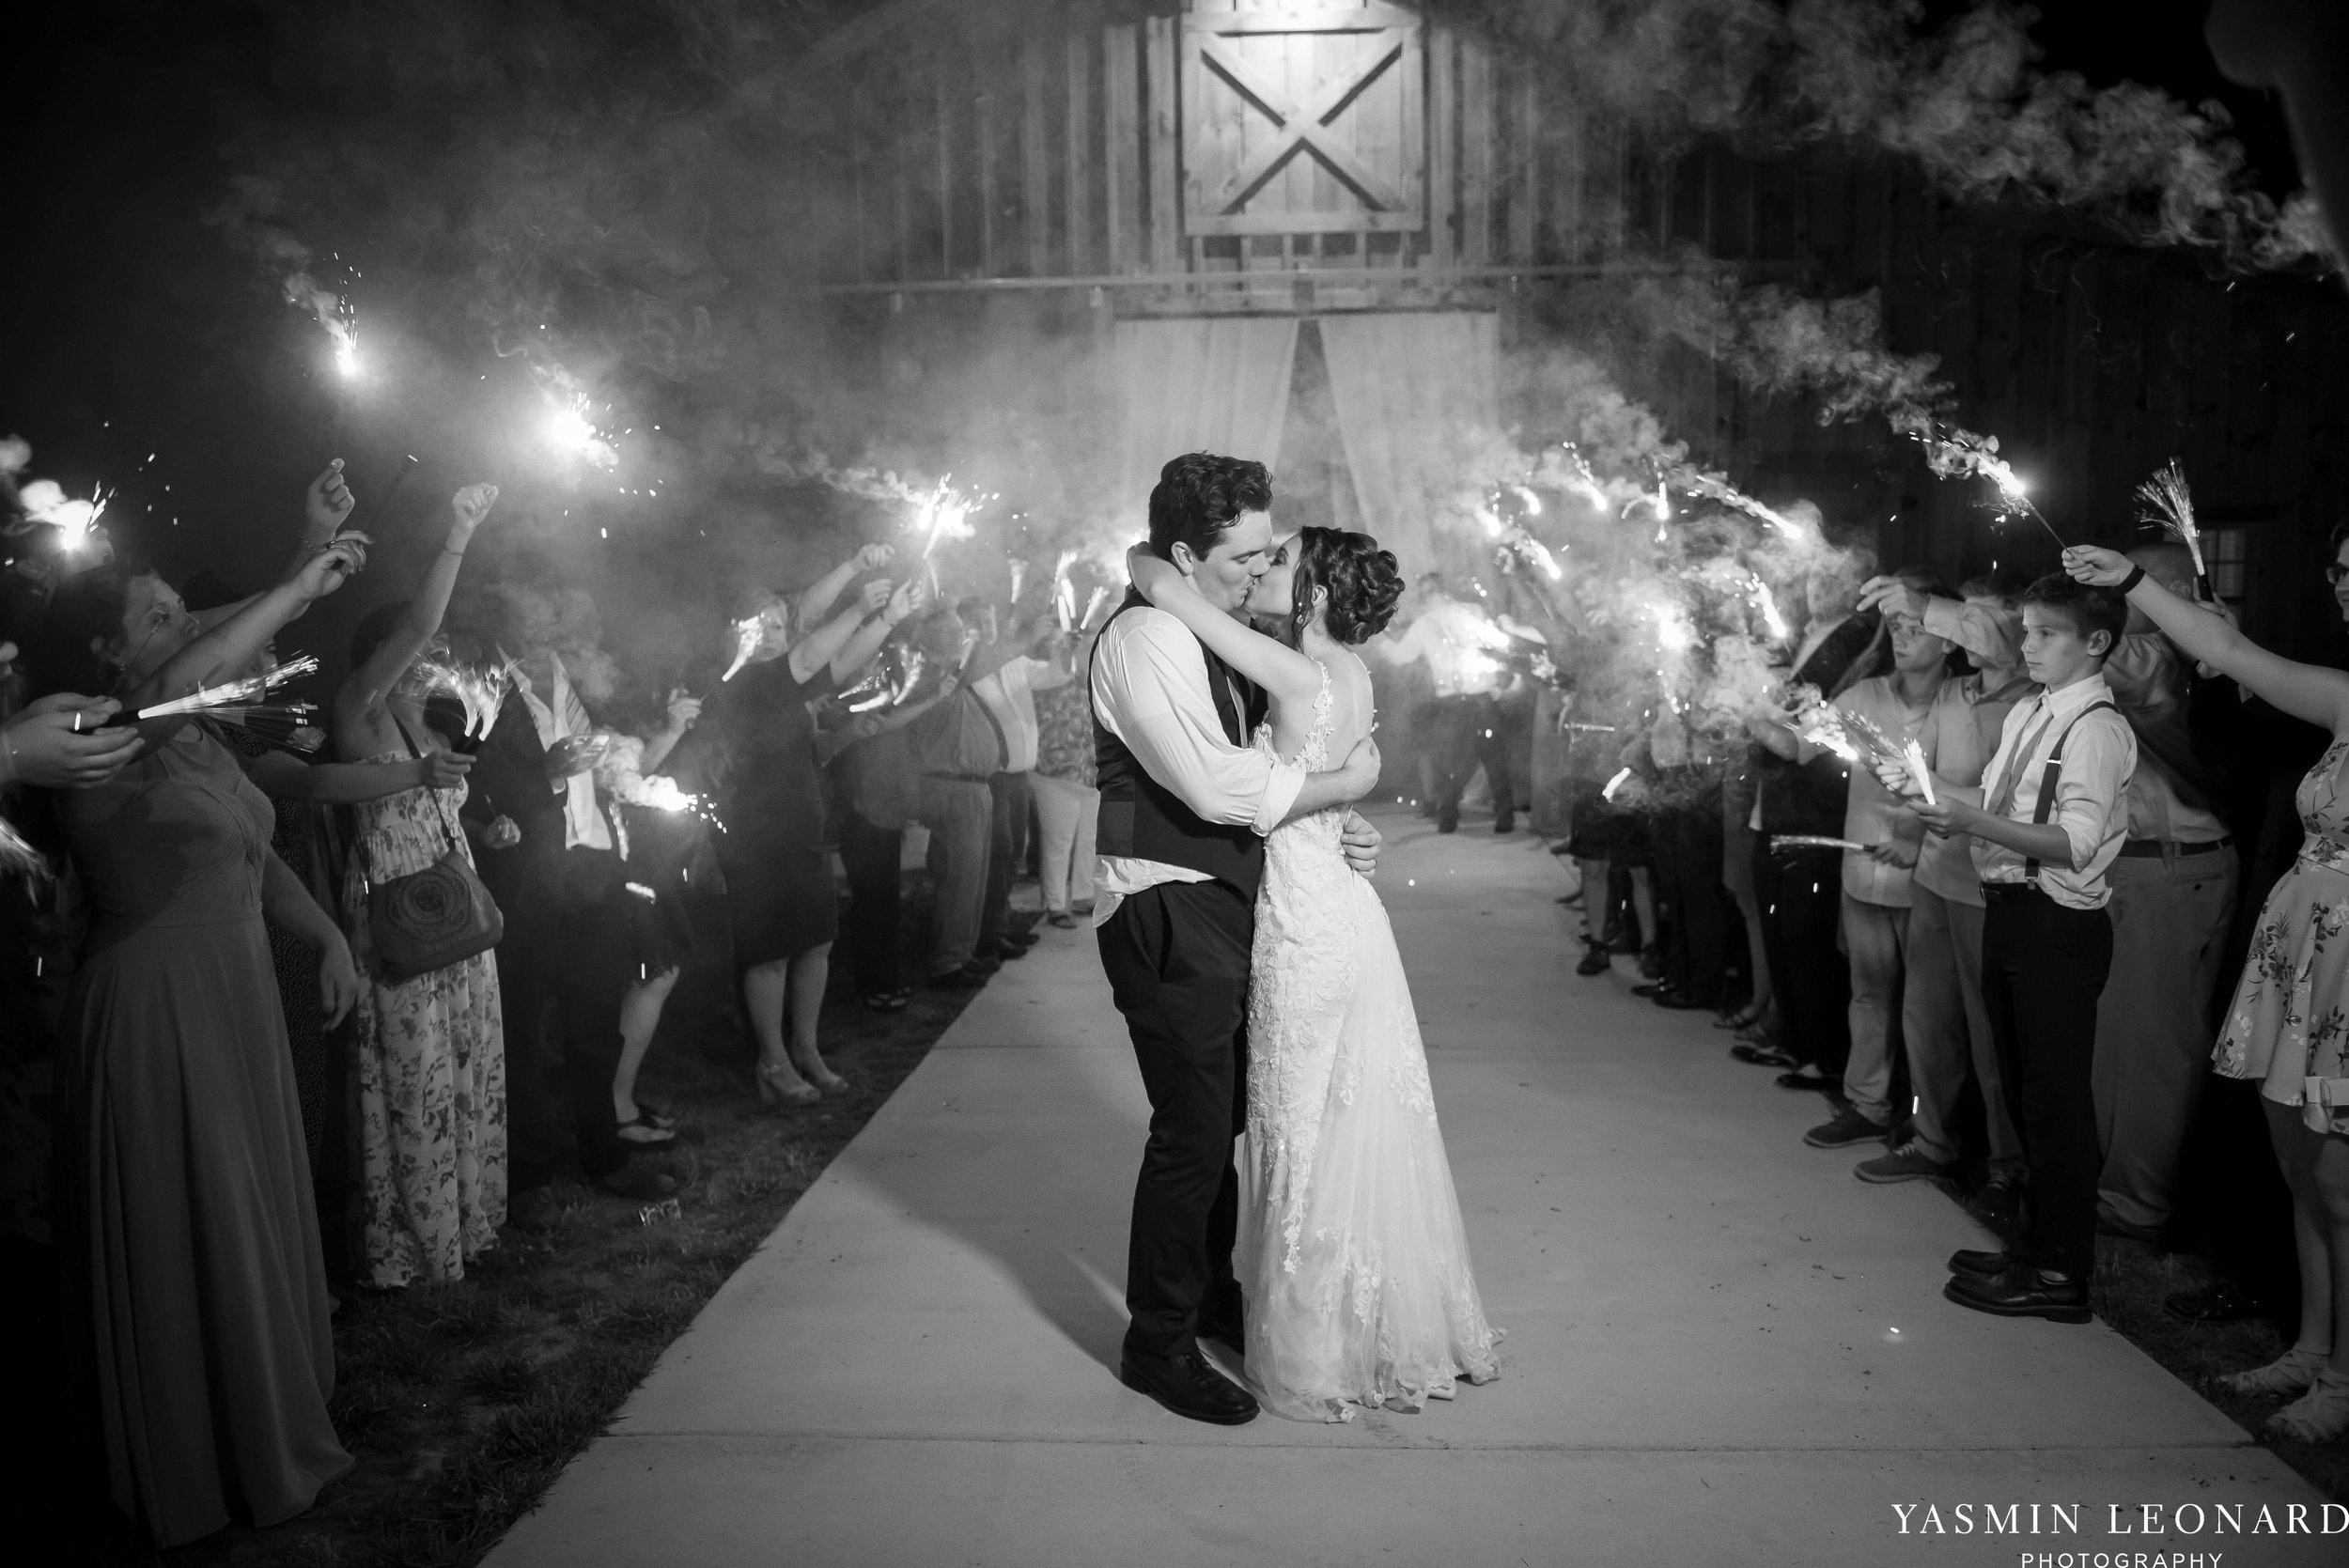 Old Homeplace Vineyard - NC Weddings - Outdoor Summer Weddings - Peony Boutique - Vineyard Wedding - NC Photographer - Yasmin Leonard Photography-81.jpg